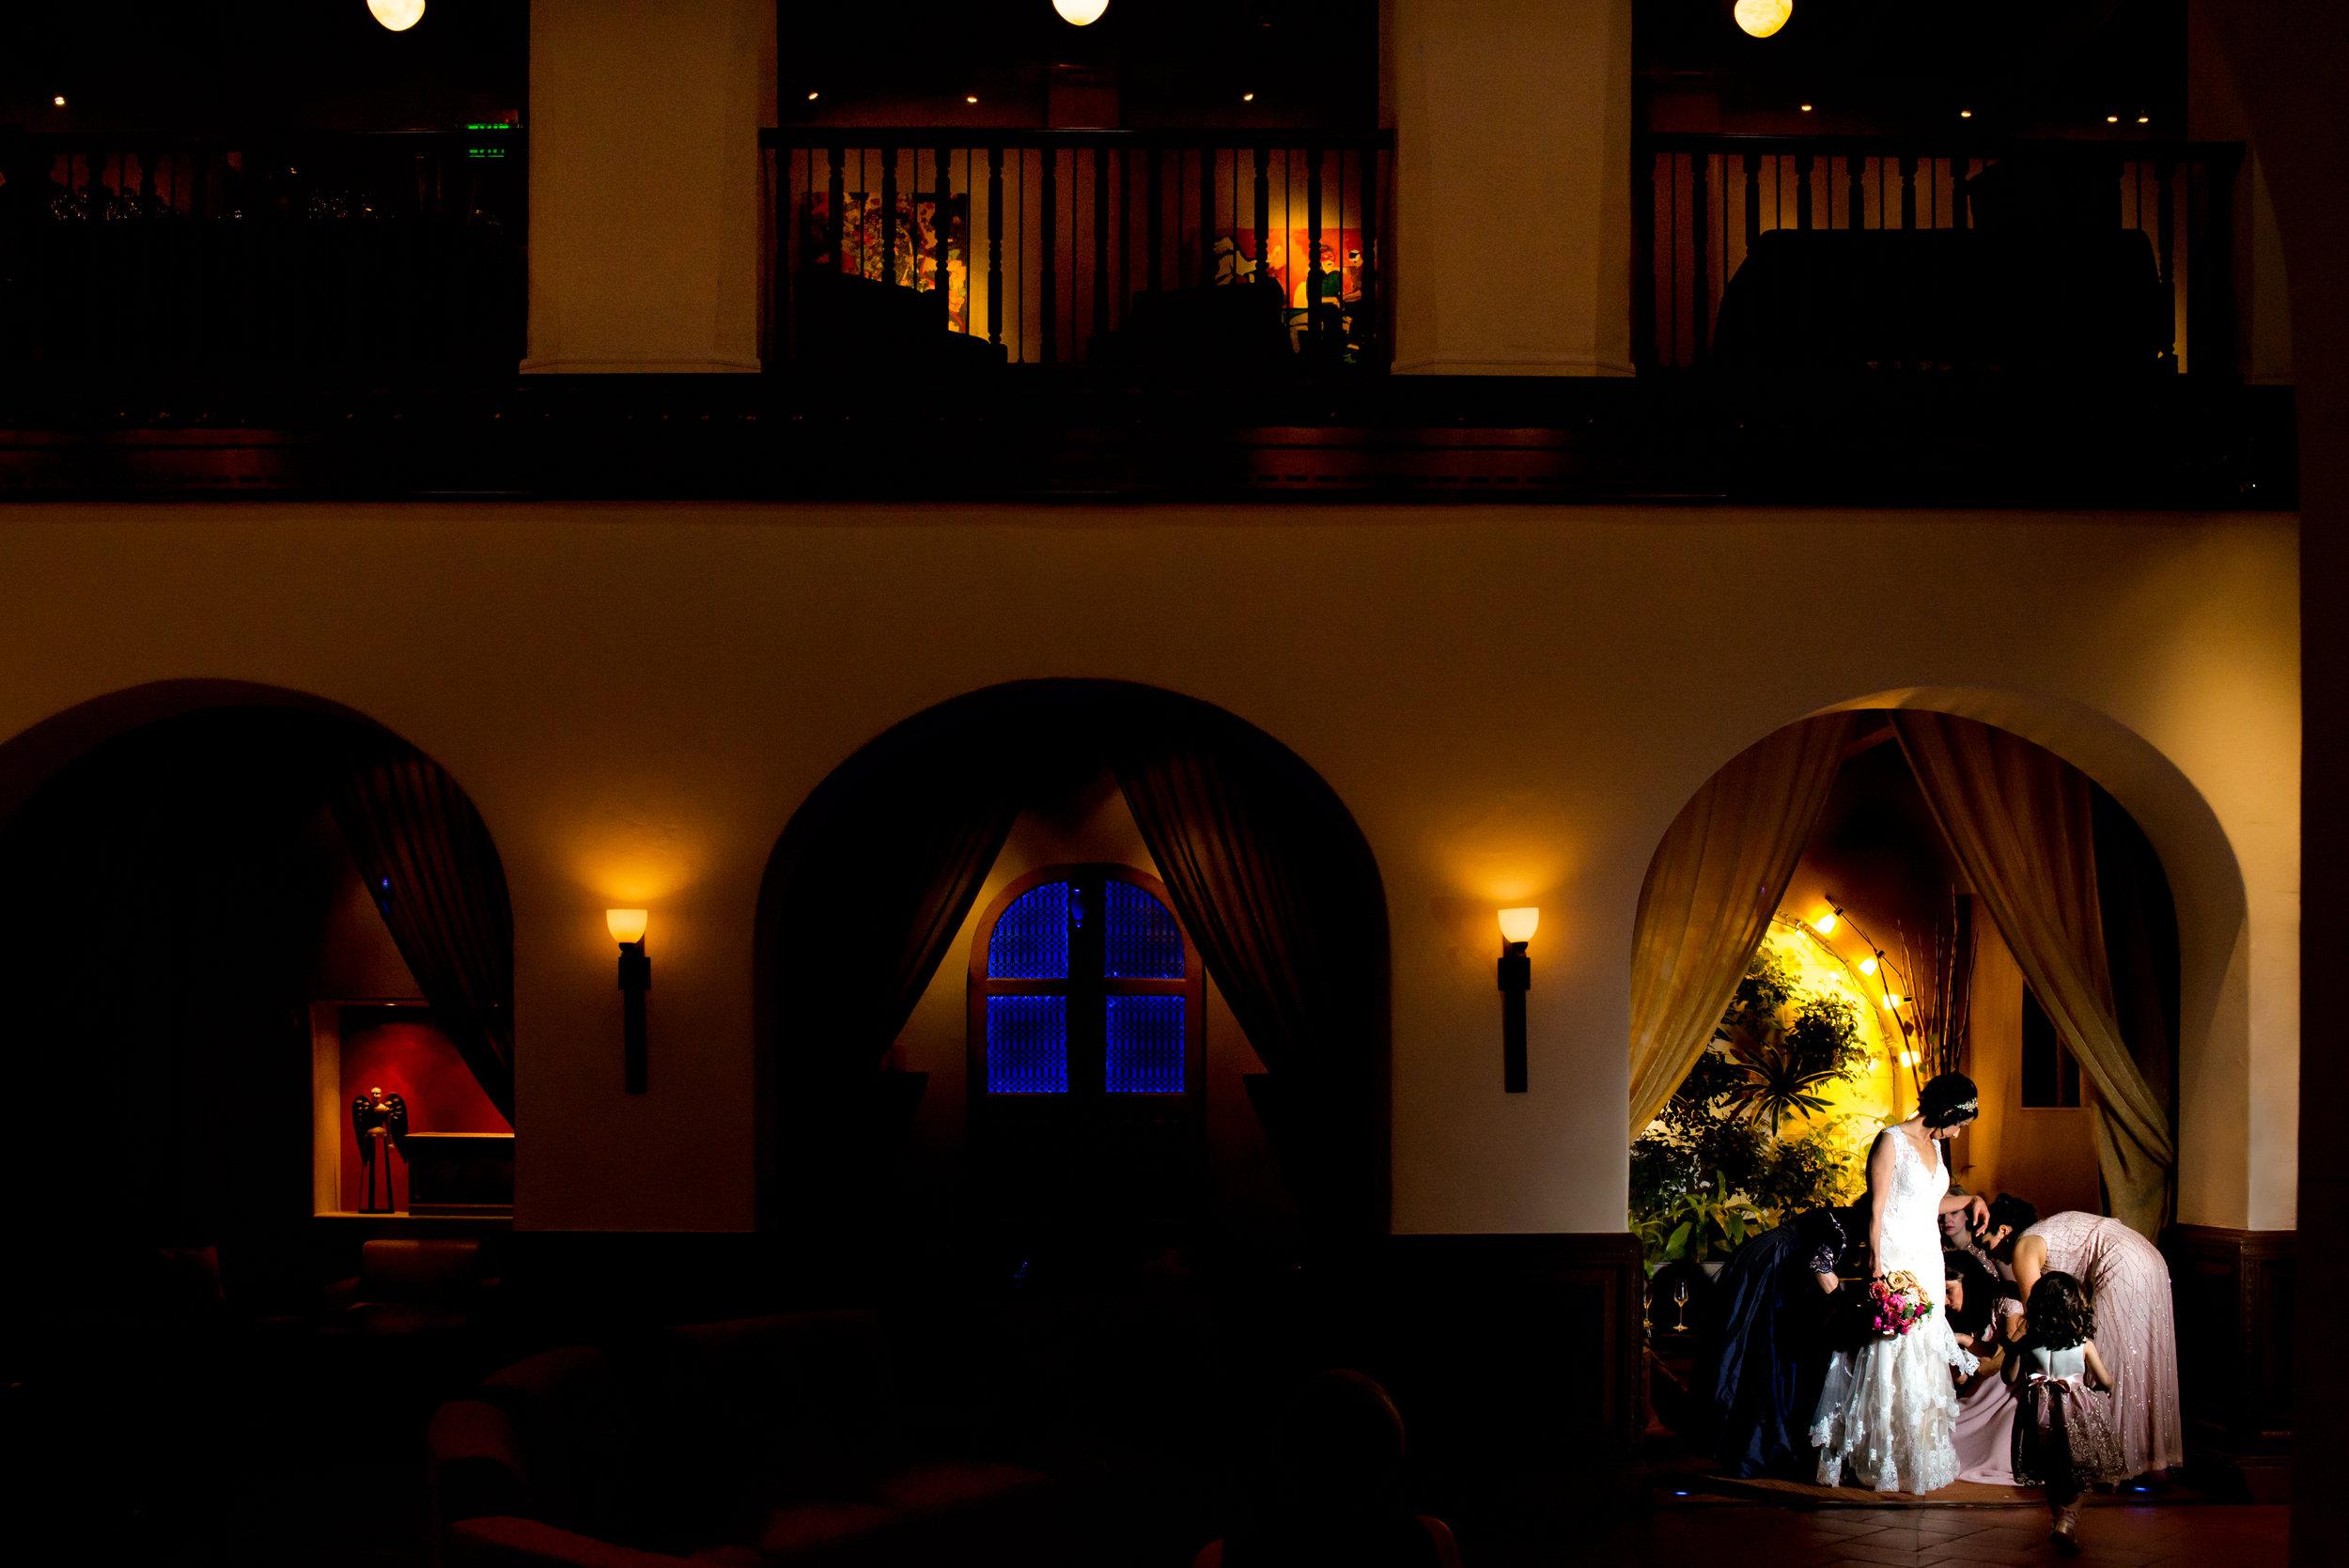 Extended_Play_Photography_Carmella_Wedding-16.jpg